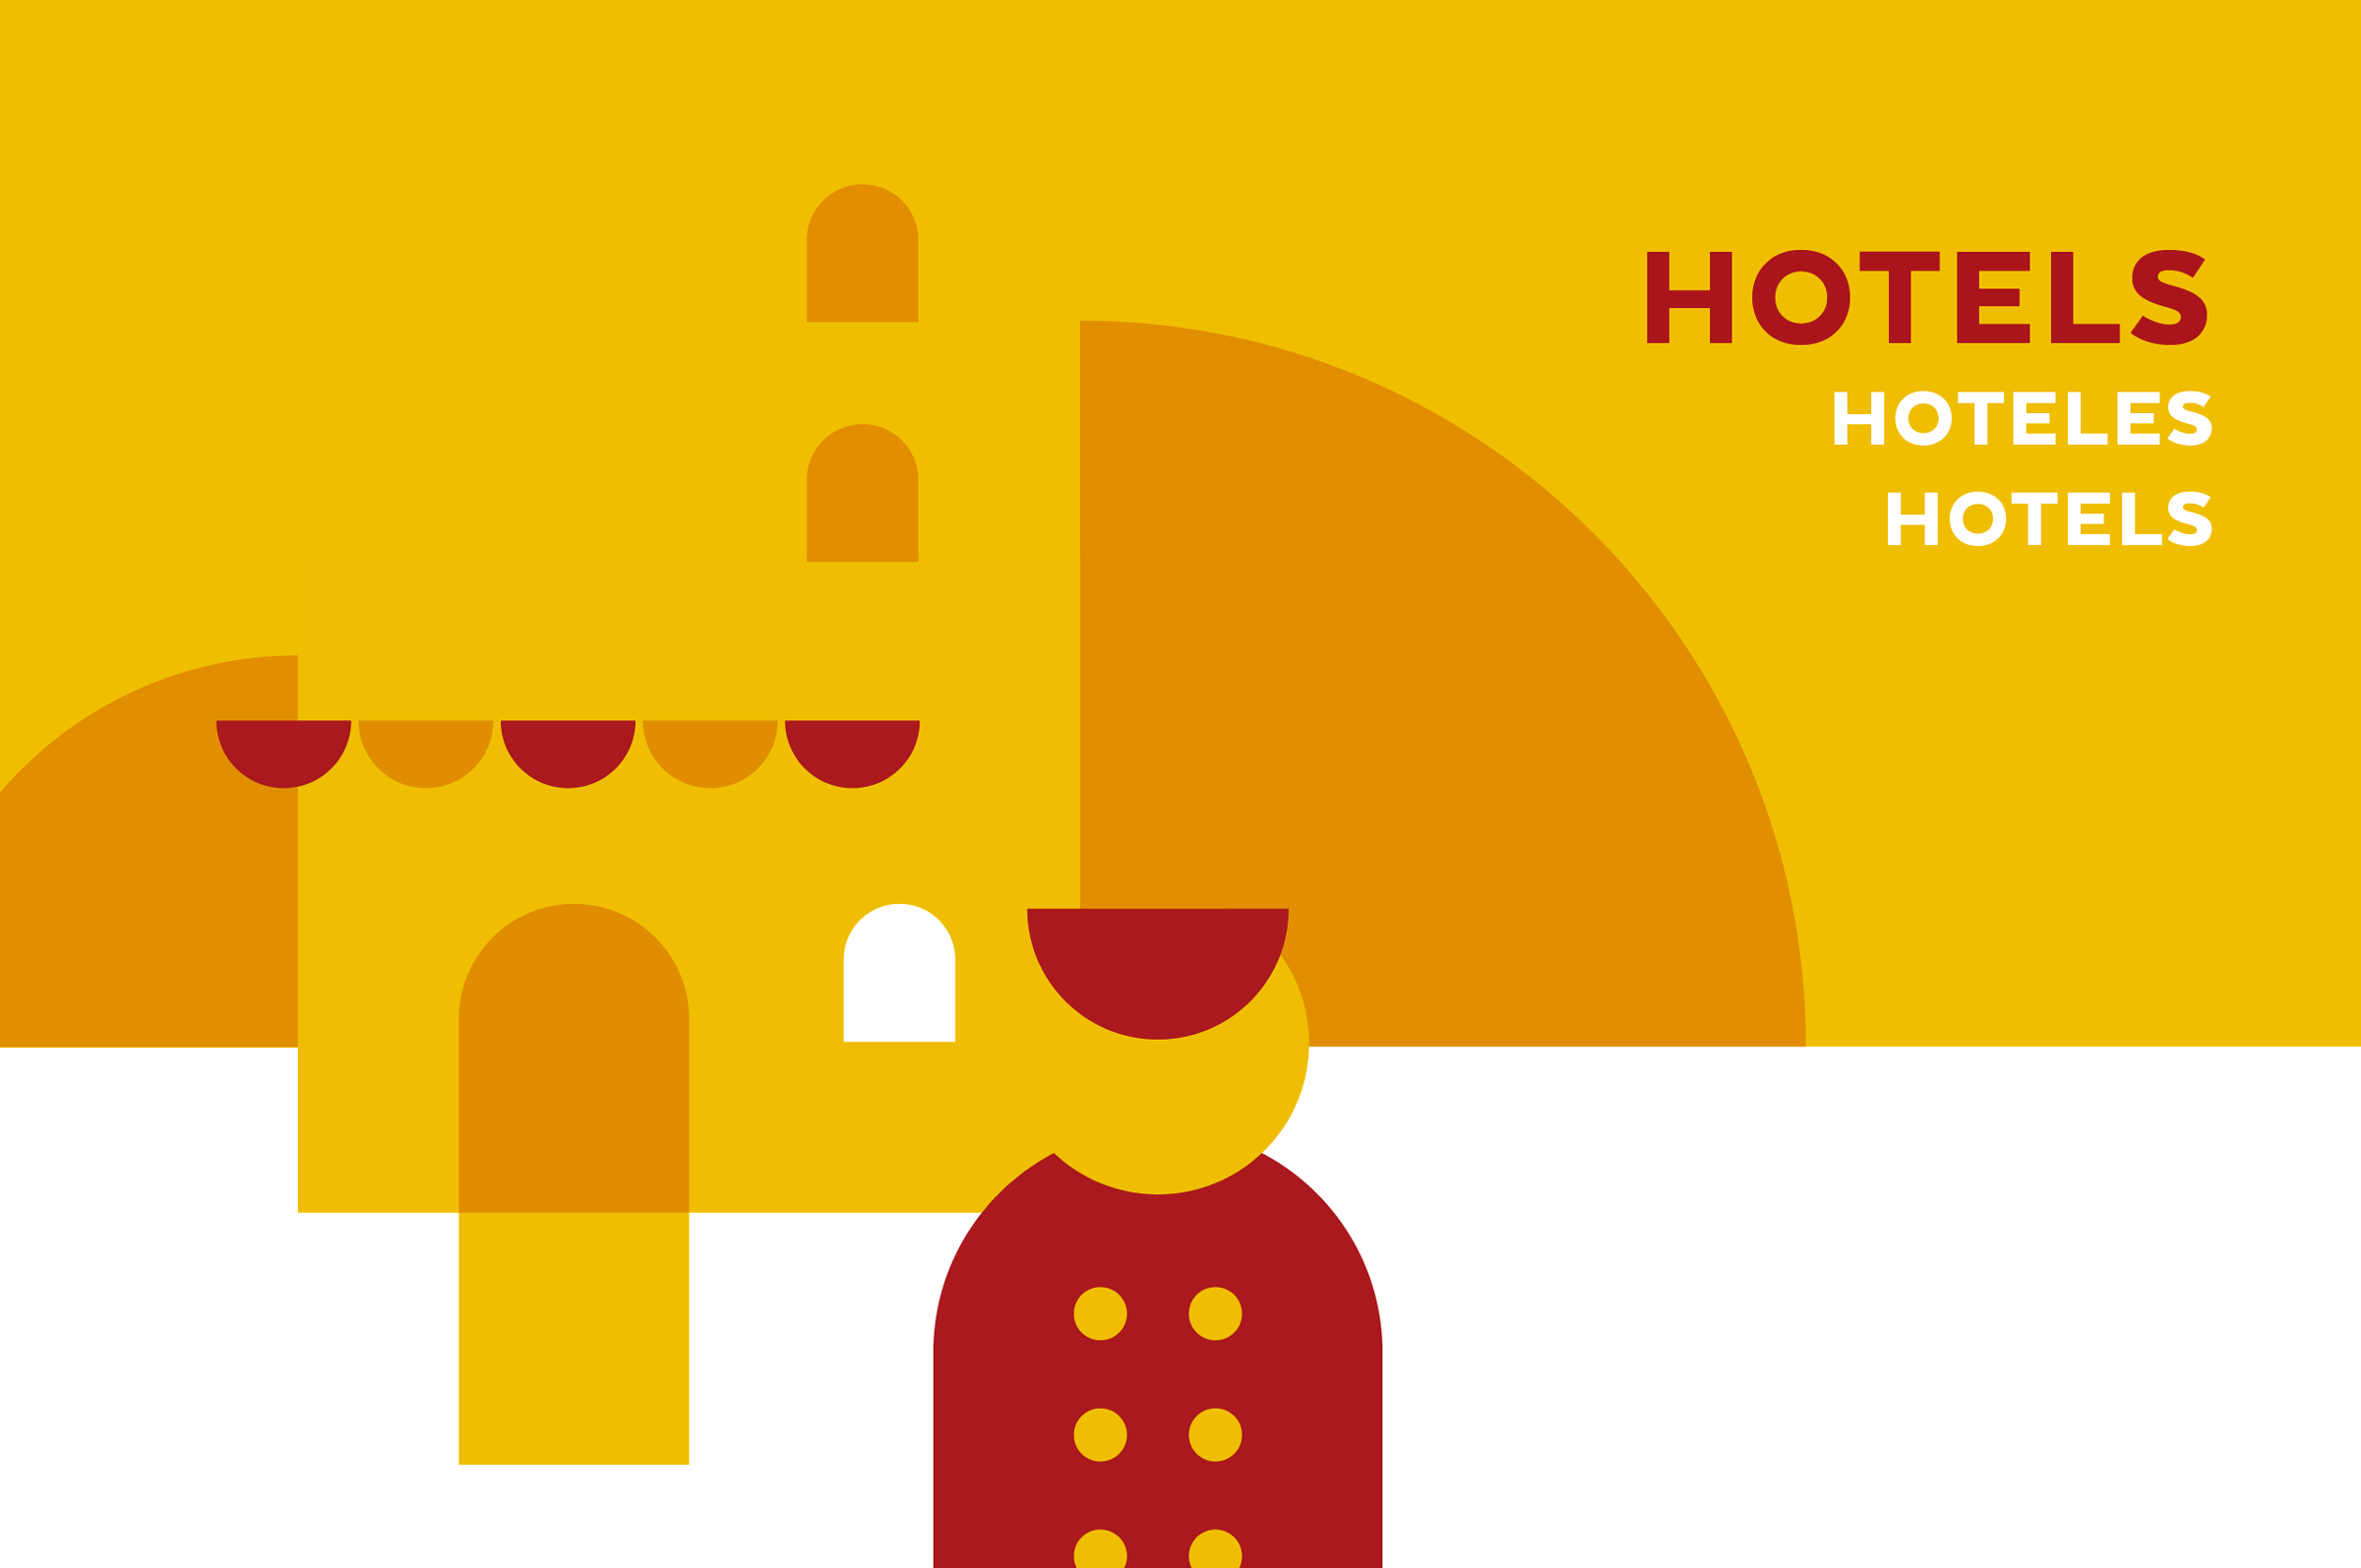 ocio7-illustration-hotels-buero-ink-graphic